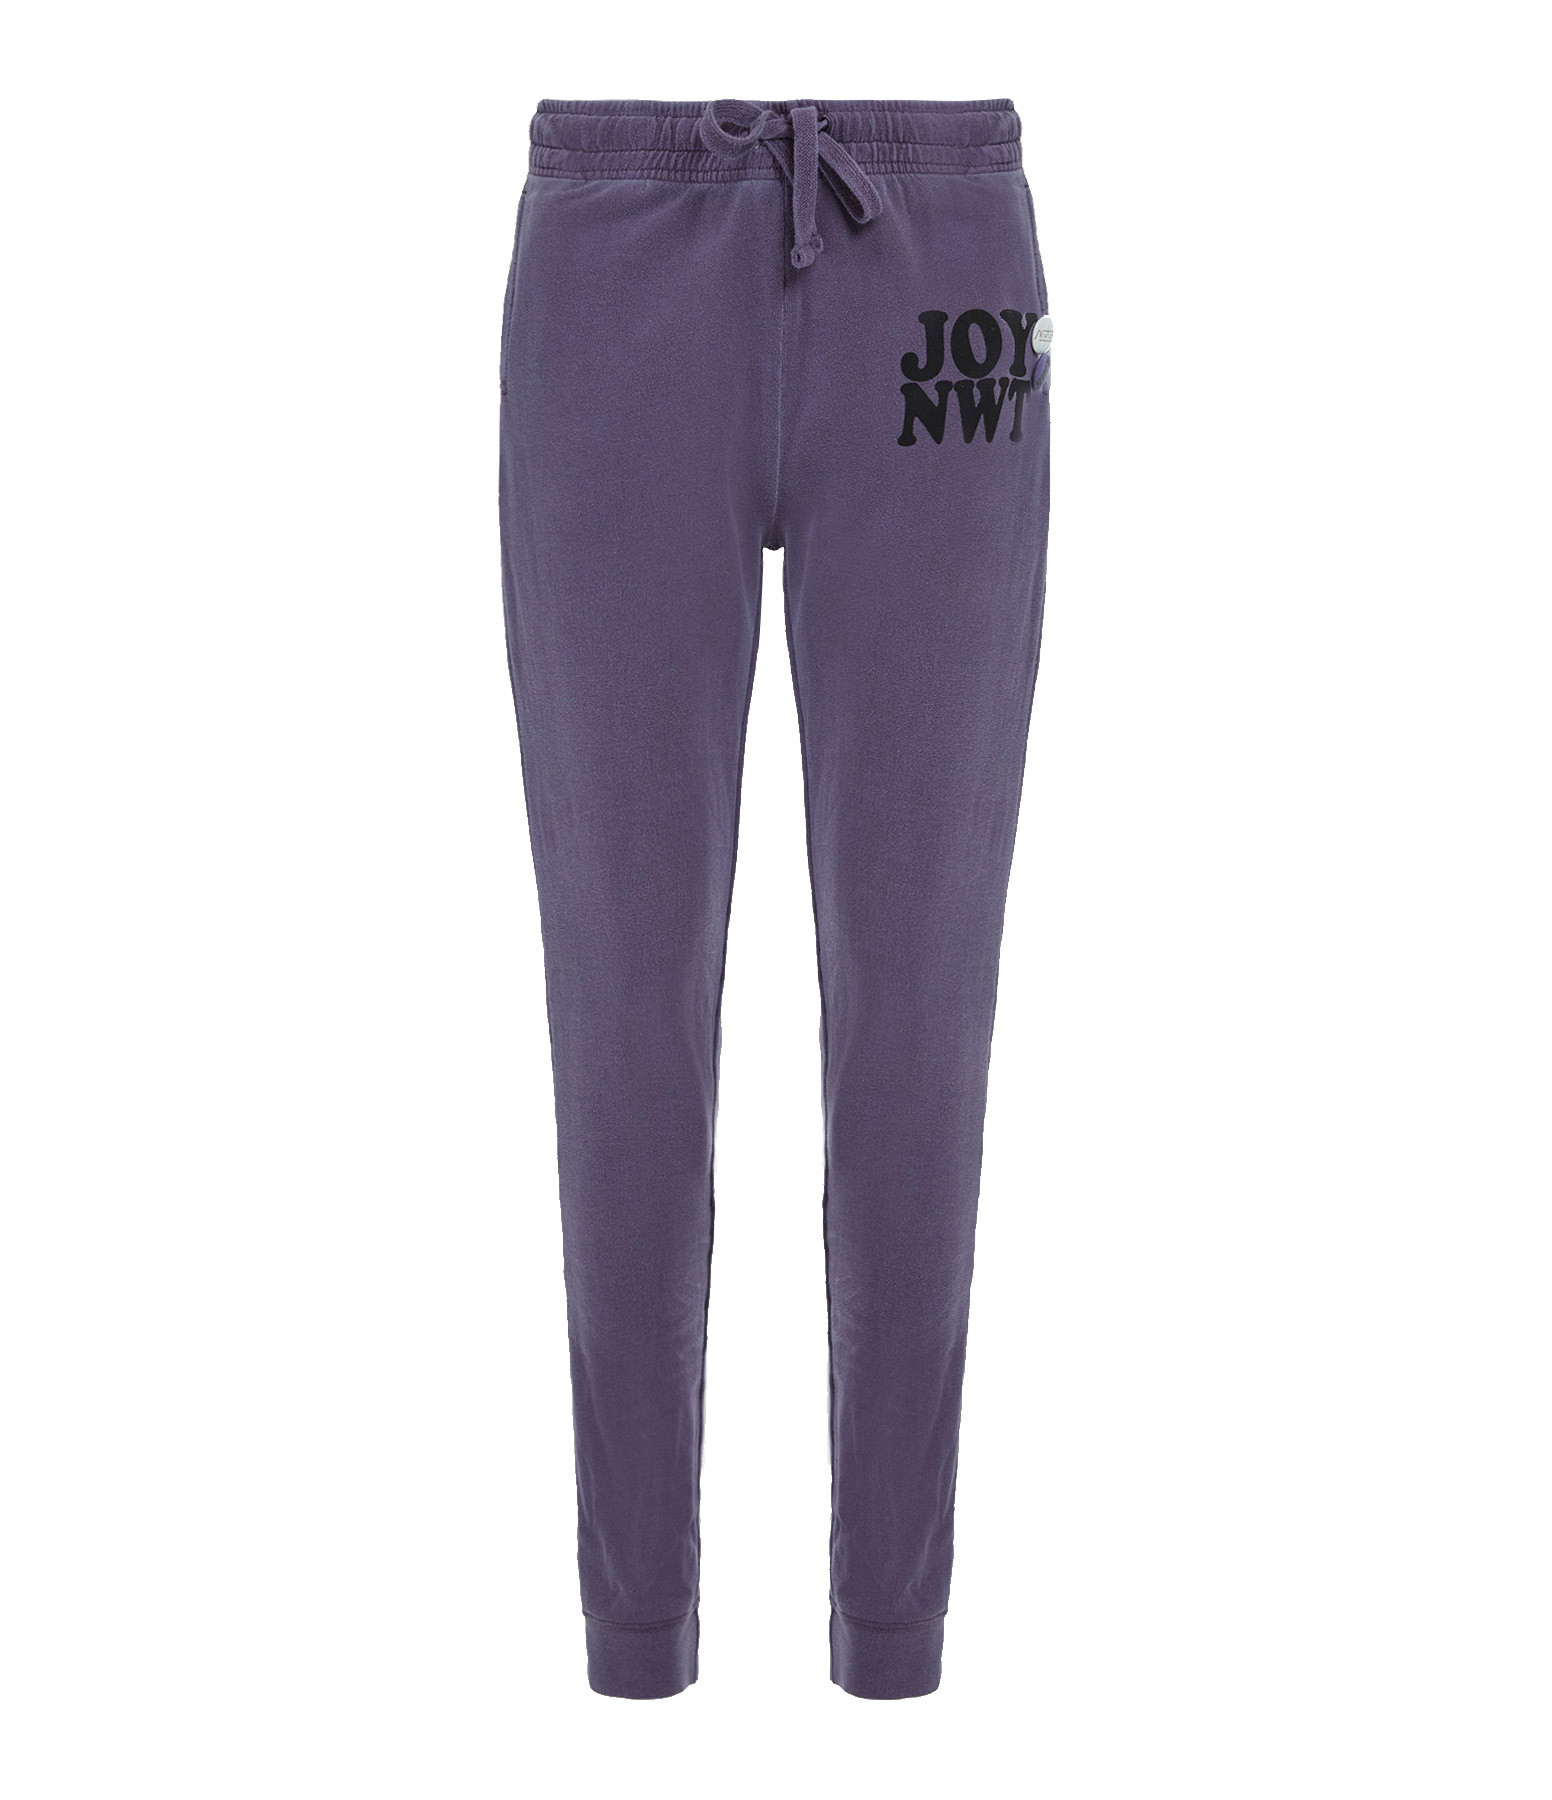 NEWTONE - Jogging Joy Coton Violet Grappe